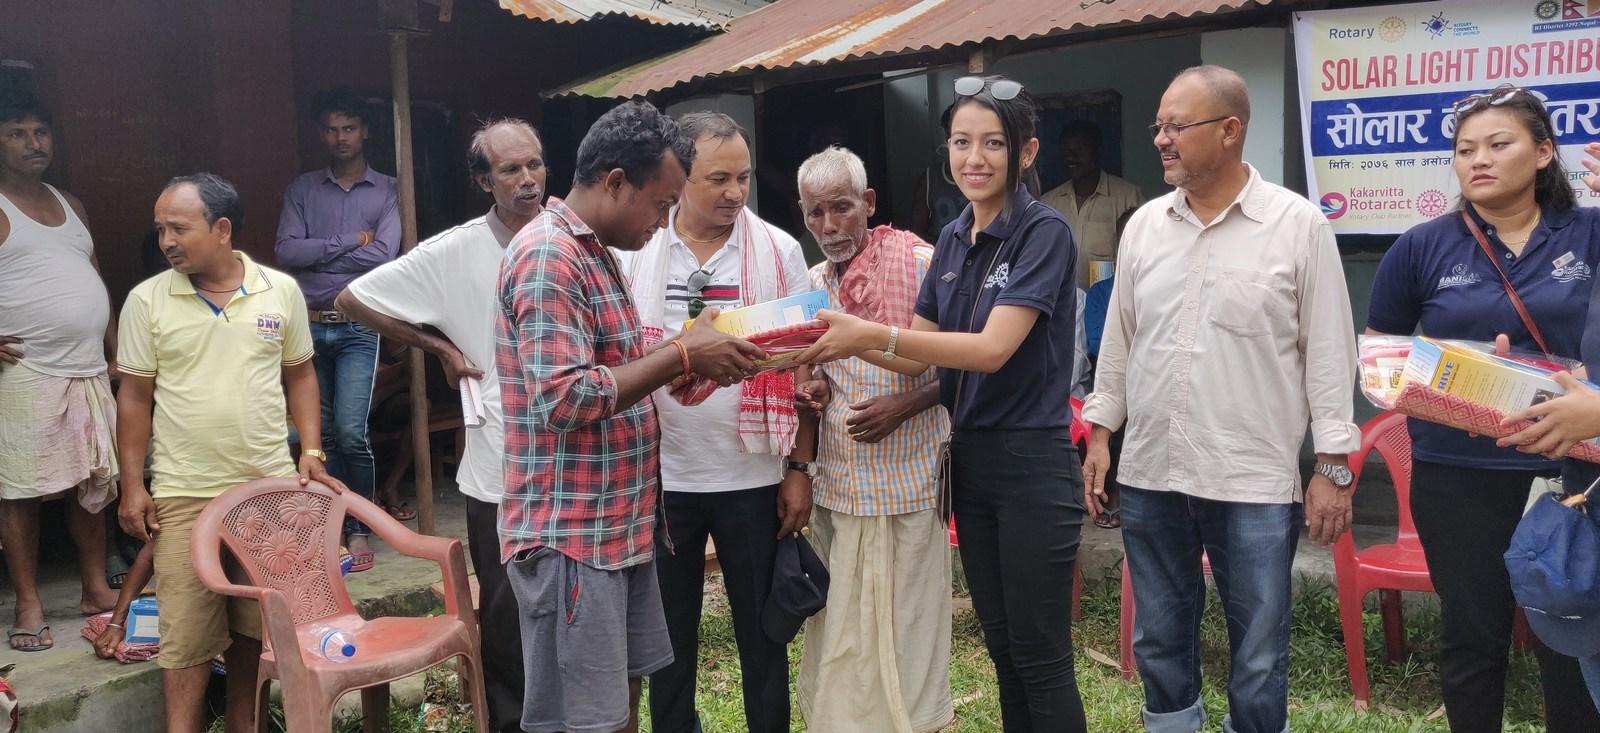 Solar-Light-Distribution-Program-Rotary-Club-of-Kakarvitta-19